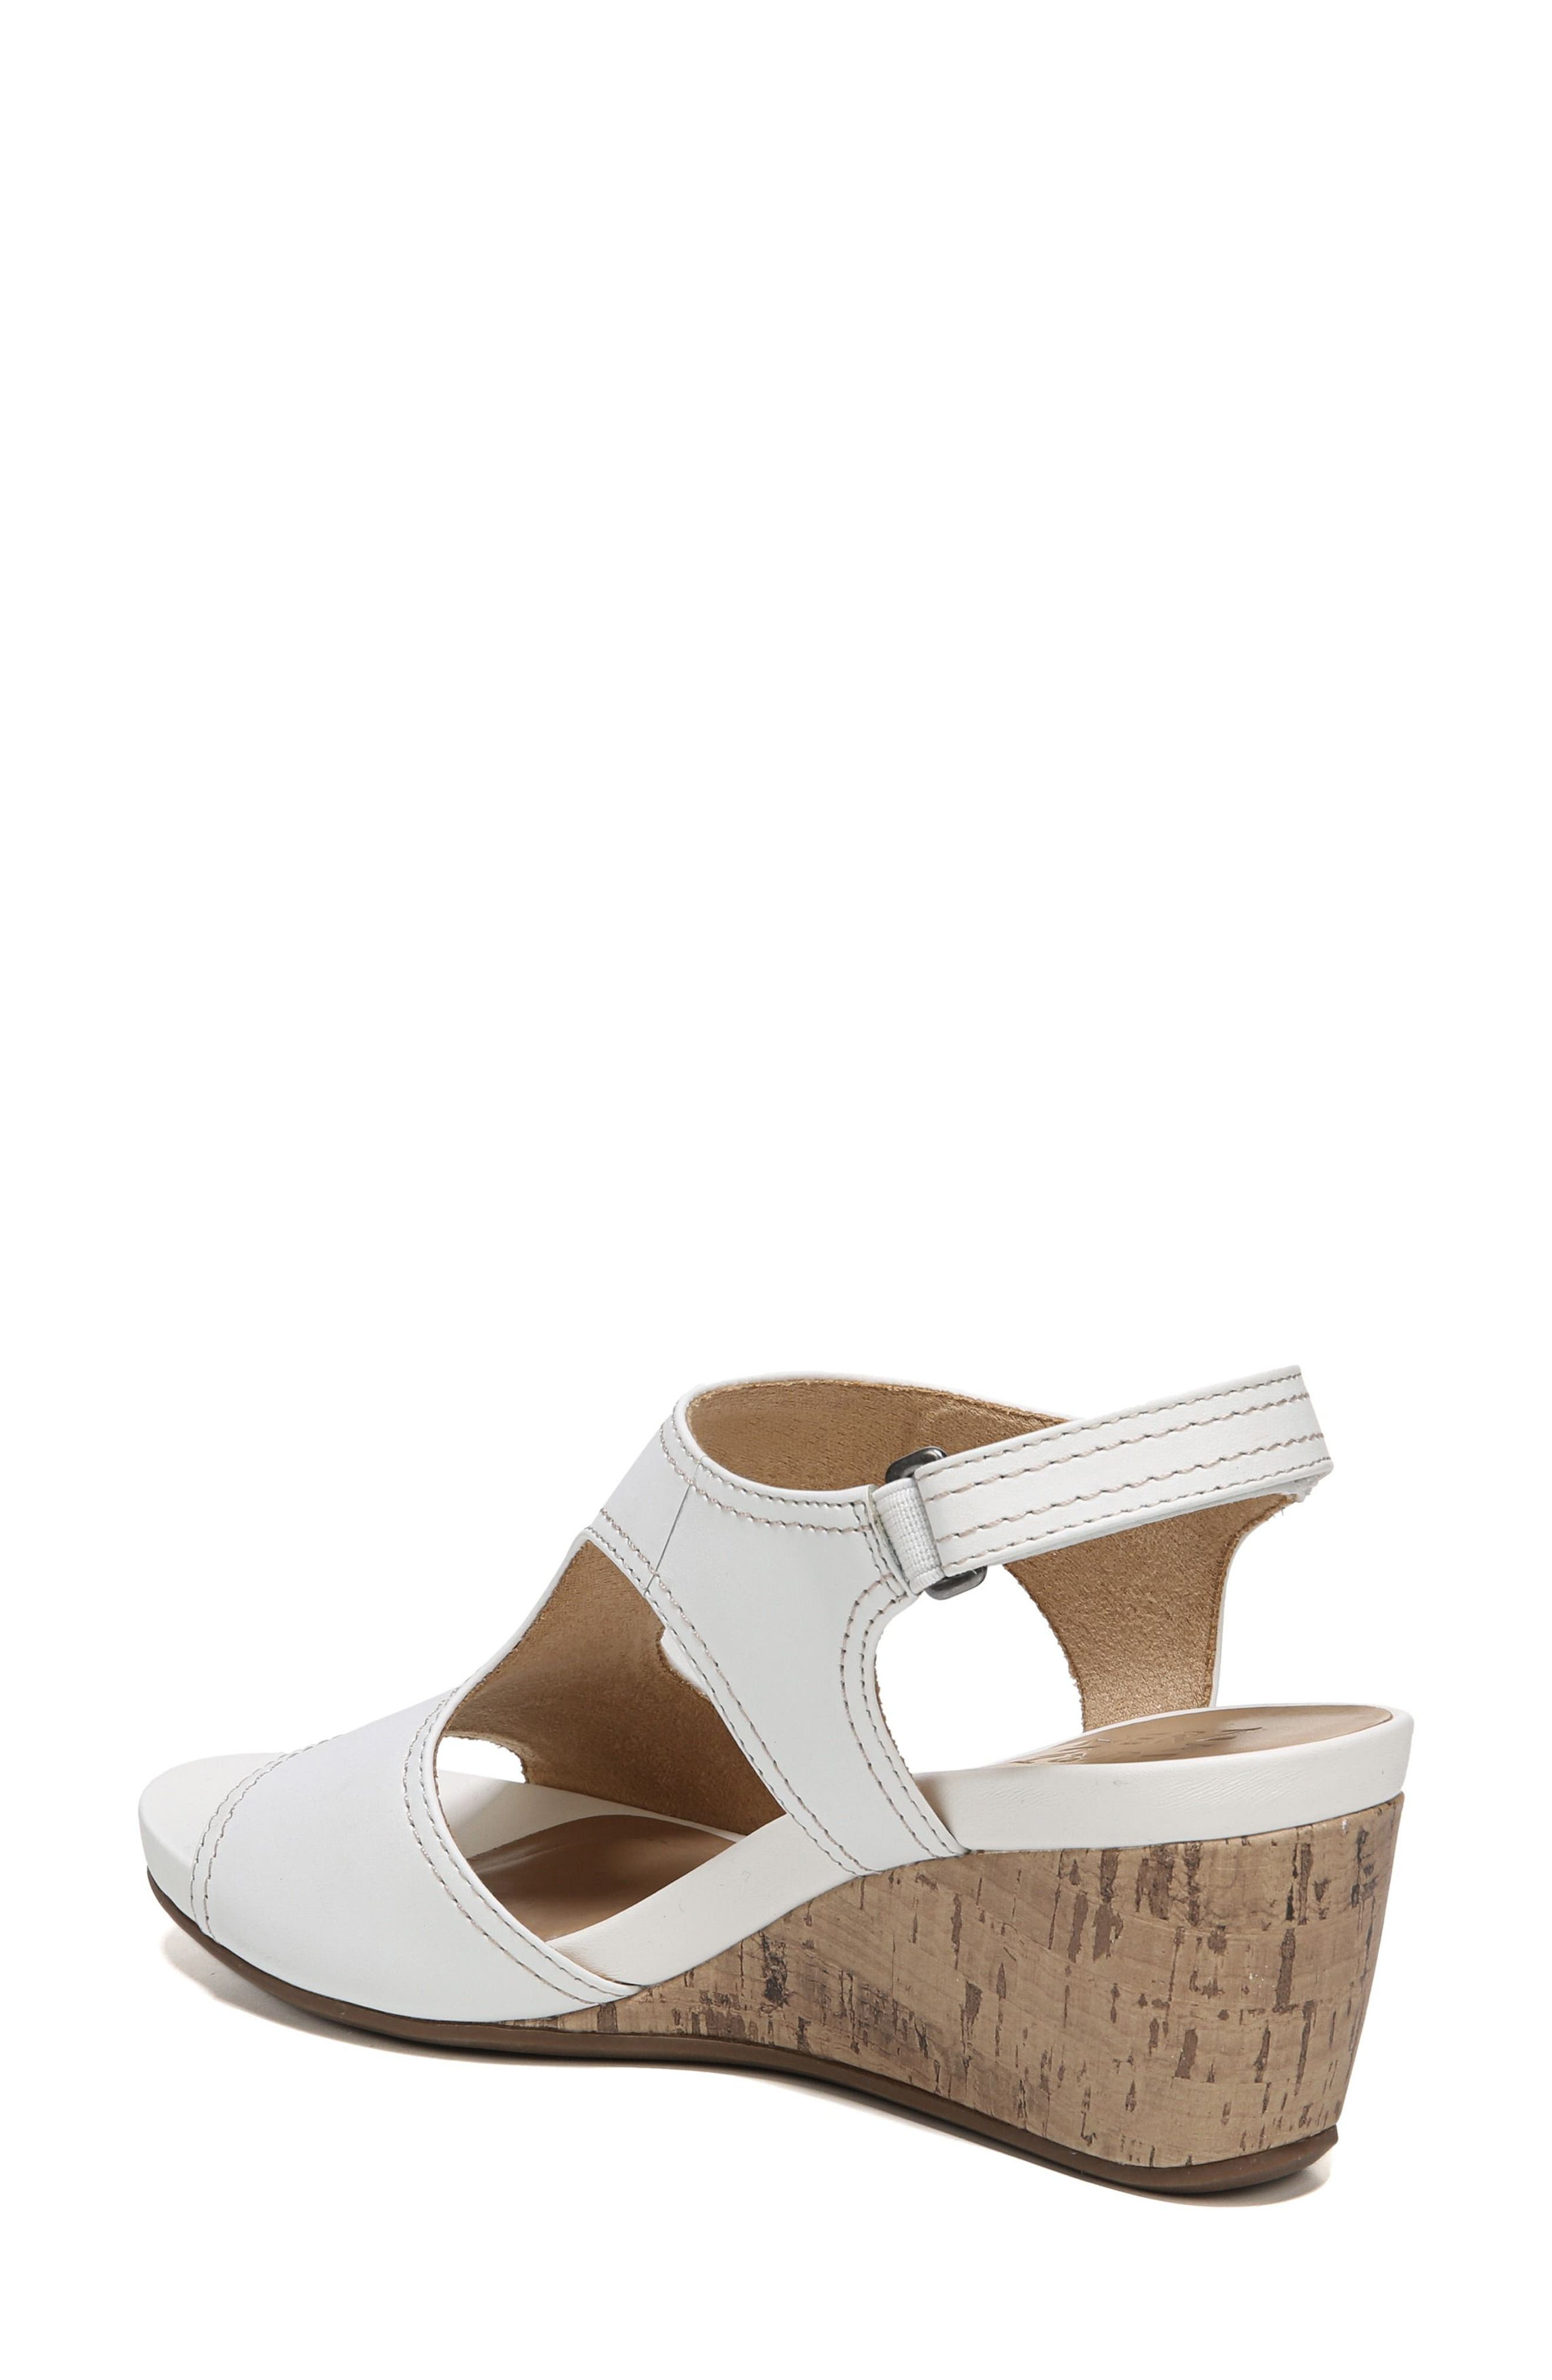 Cinda Wedge Sandal,                             Alternate thumbnail 2, color,                             White Leather